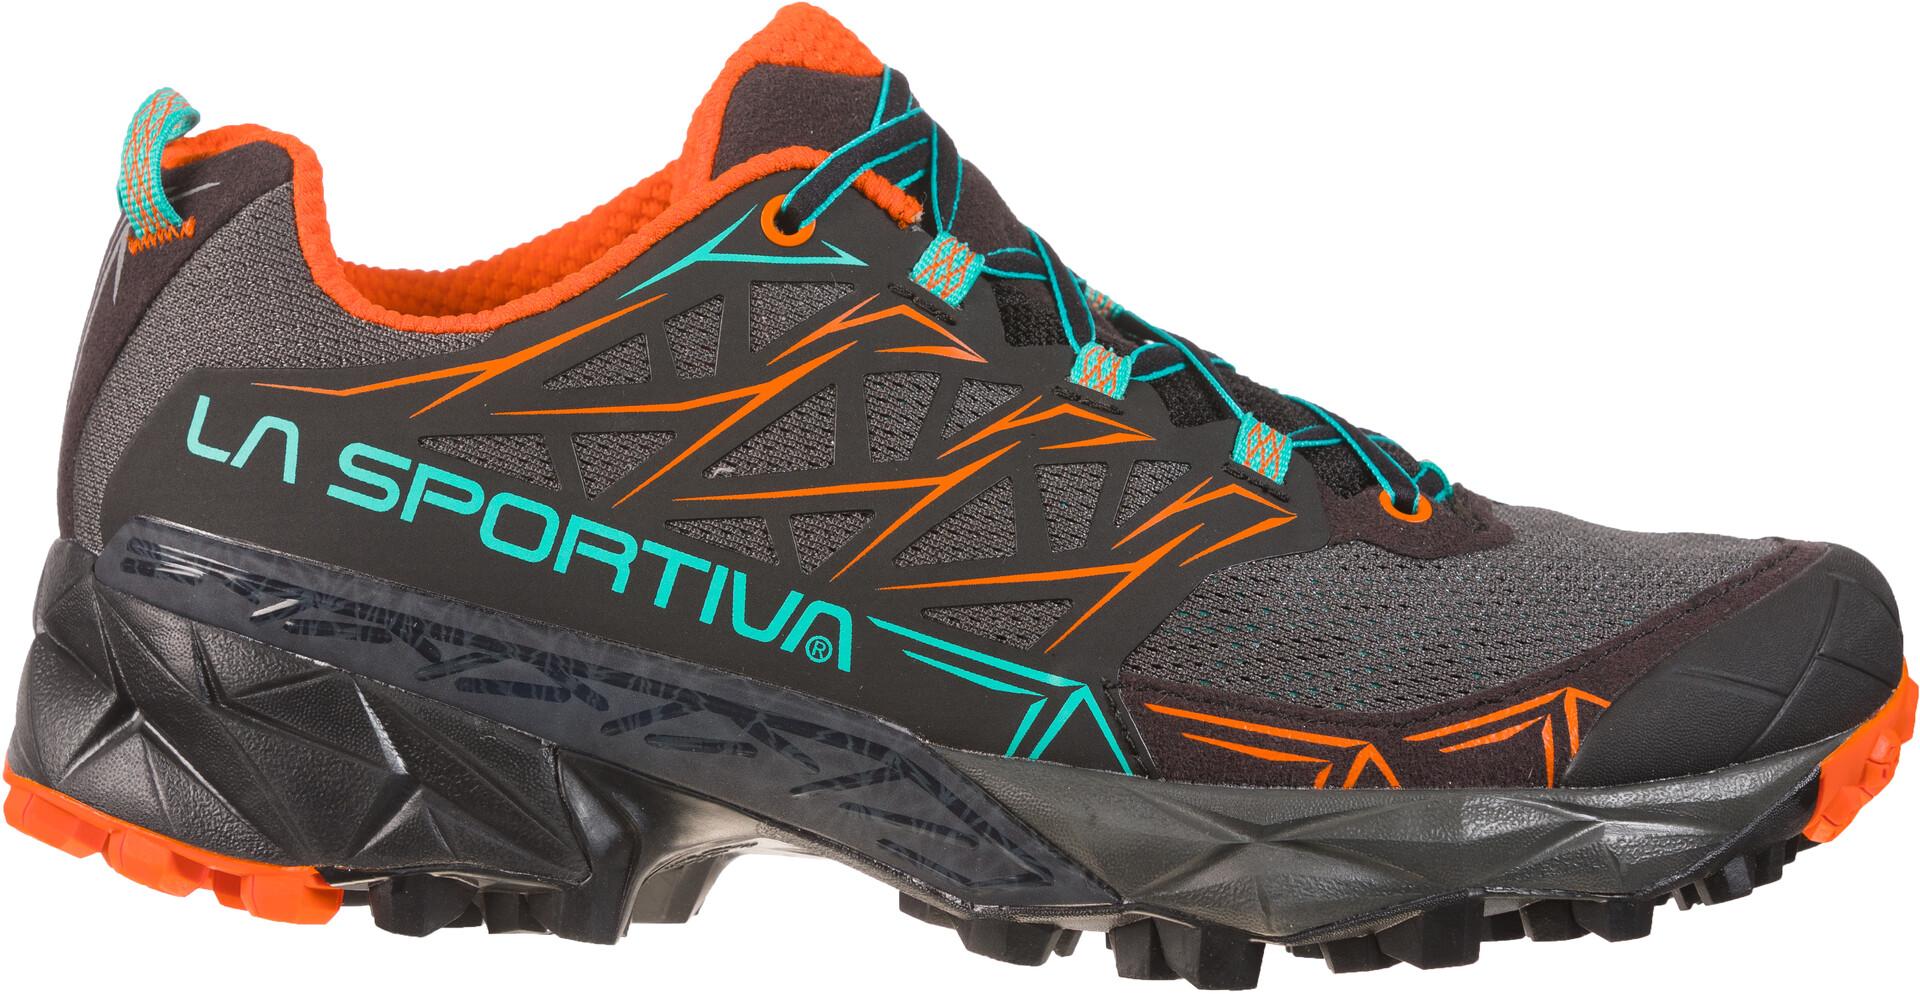 Akyra Women Blackaqua Shoes Running La Sportiva iPZXku